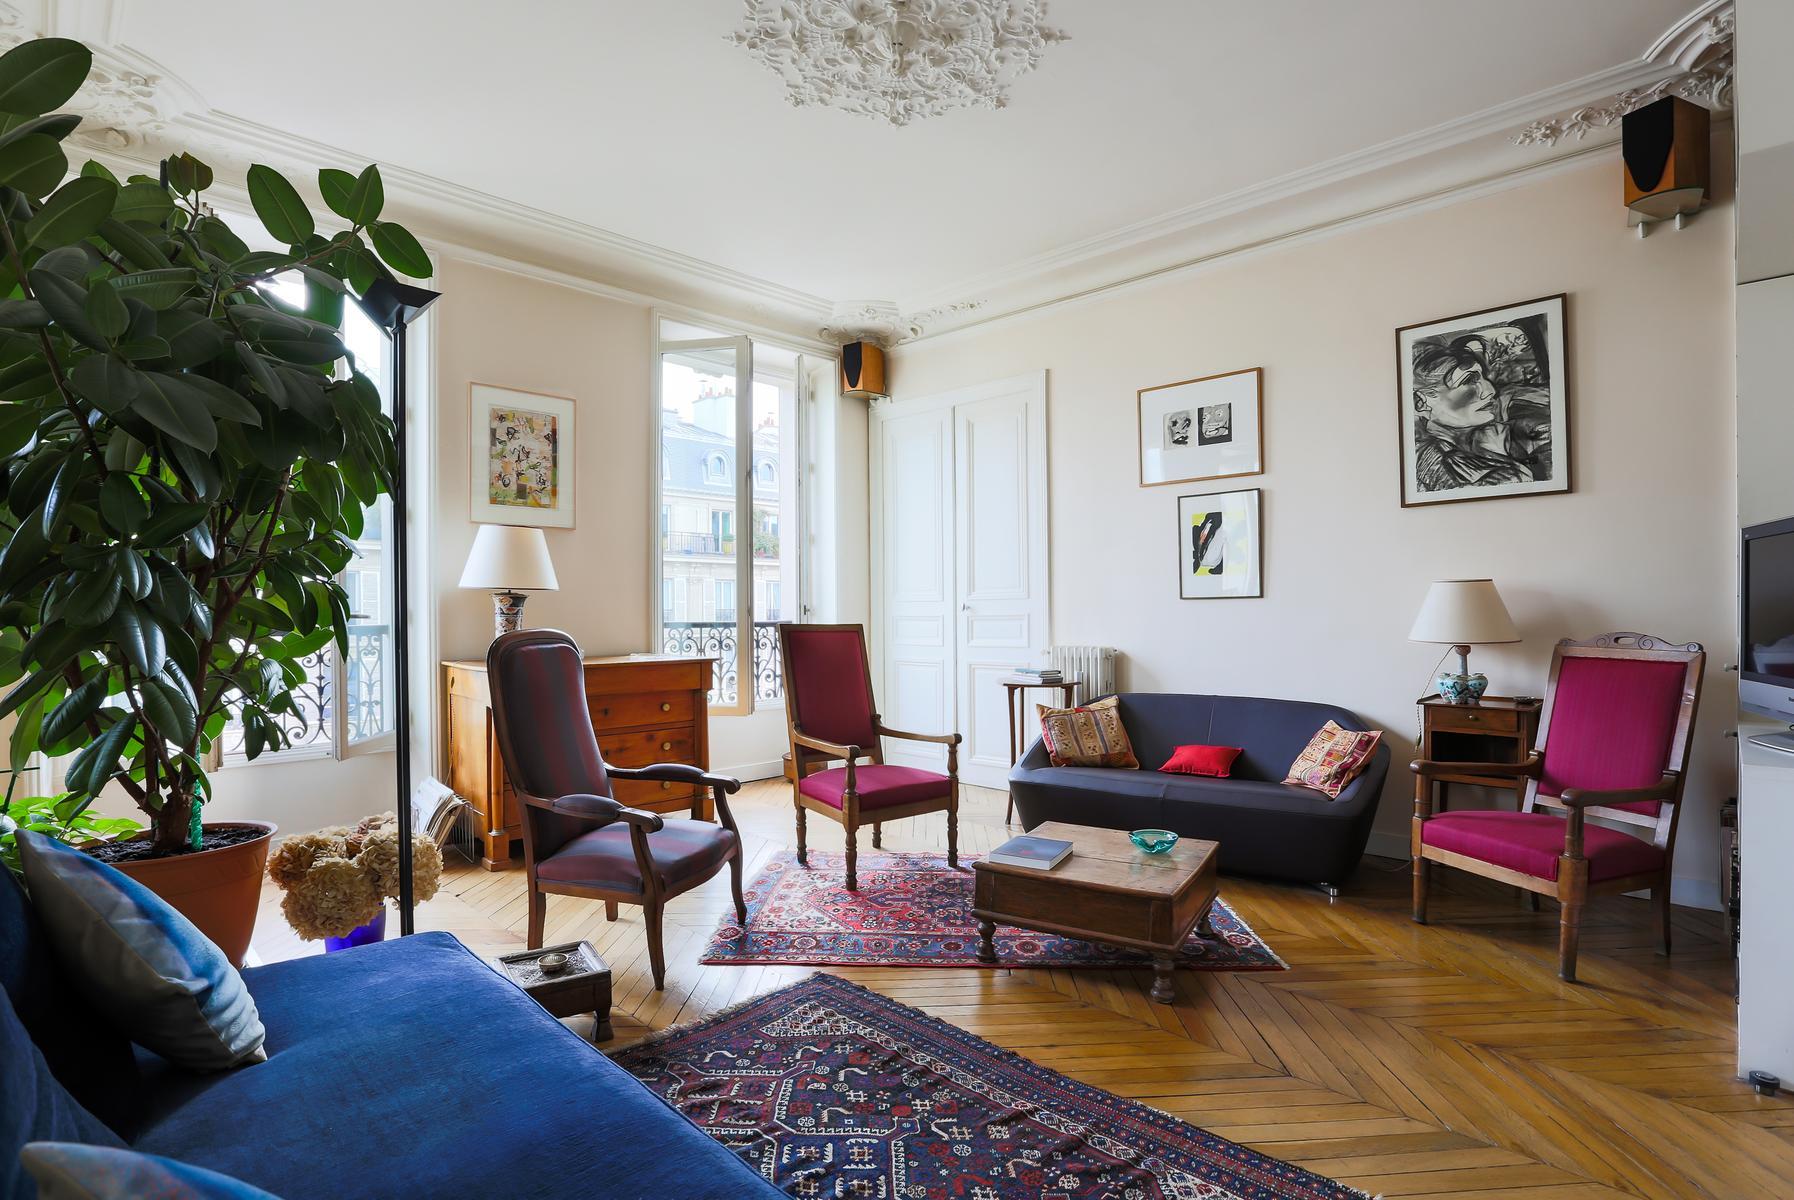 Chic Paris apartments near Gare du Nord train station - All luxury apartments